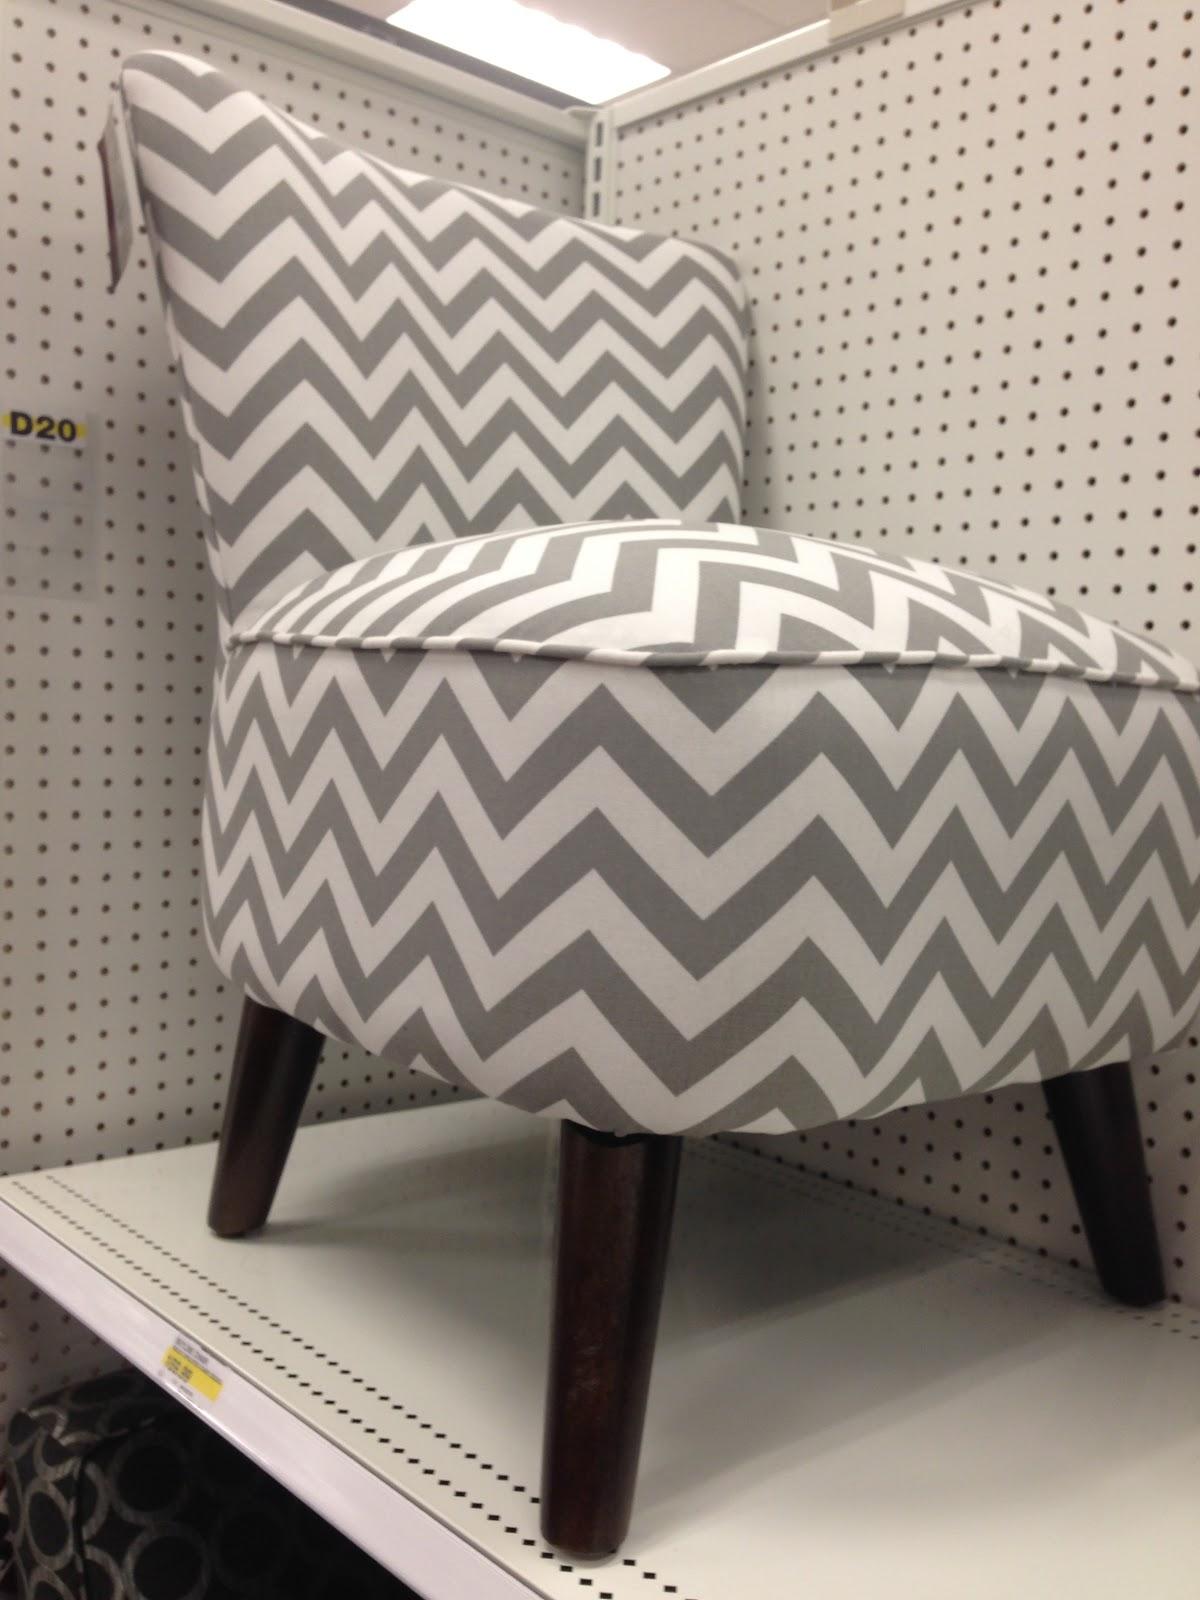 Grey And White Chevron Chair..... Need I Say More? 160 Bucks!